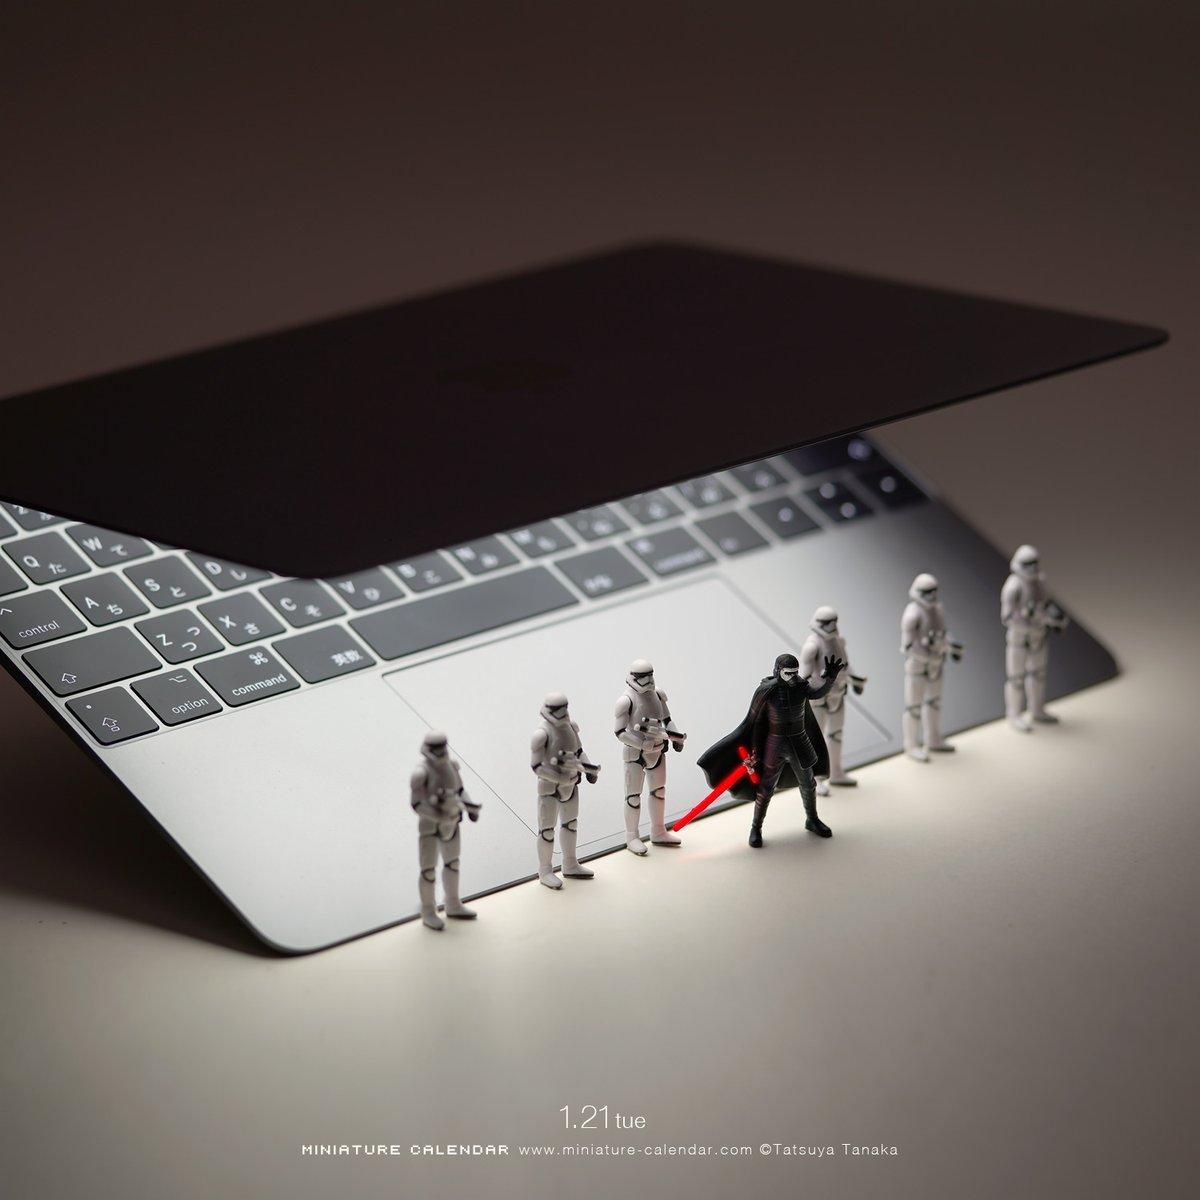 #verano2020☀️ #martes  #notebook #laptop #serviciotecnico  @tanaka_tatsuya #tanakatatsuya #starwars  @BkUpCompu  MALABIA 2135 #palermo  L a V de 11 a 19 hs.  S de 10 a 13 hs.  (011) 4832-8429 (011) 3313-8868  #serviciotecnico #pc #pcgaming #computer  #tablet  #smartphone #gamer